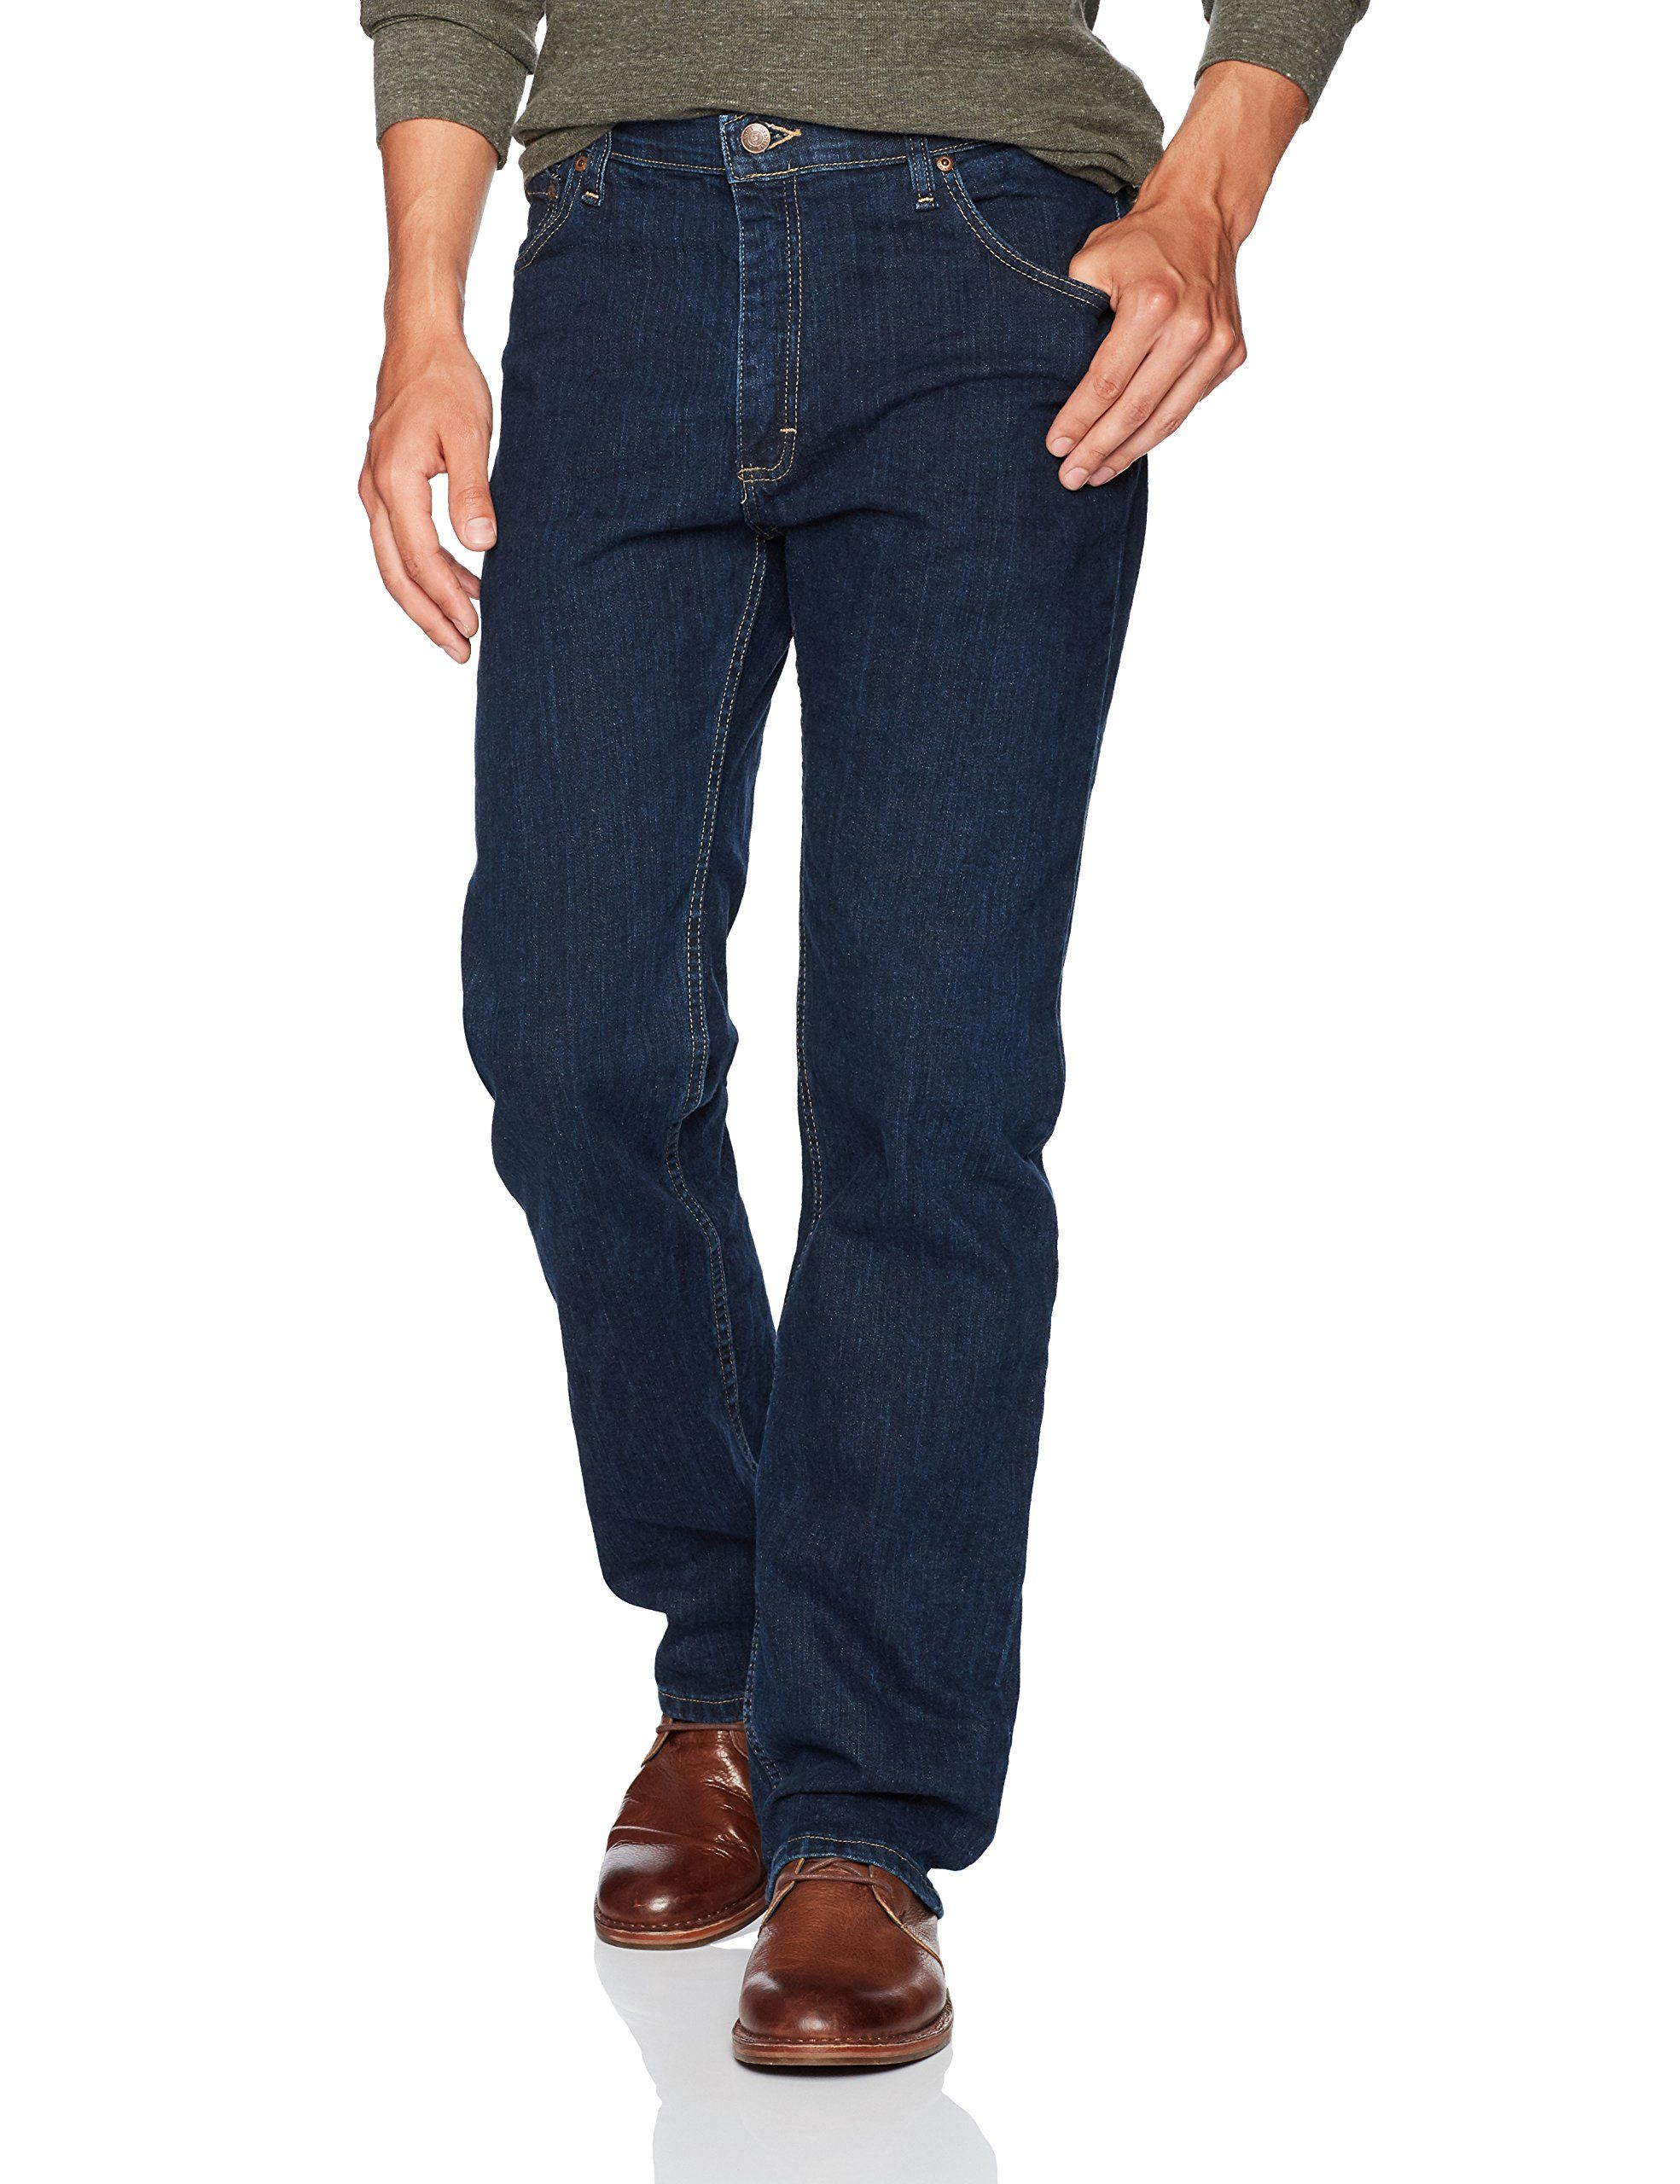 Wrangler Authentics Men's Regular Fit Comfort Flex Waist Jean | Mens jeans, Designer denim jeans, Blue jeans mens